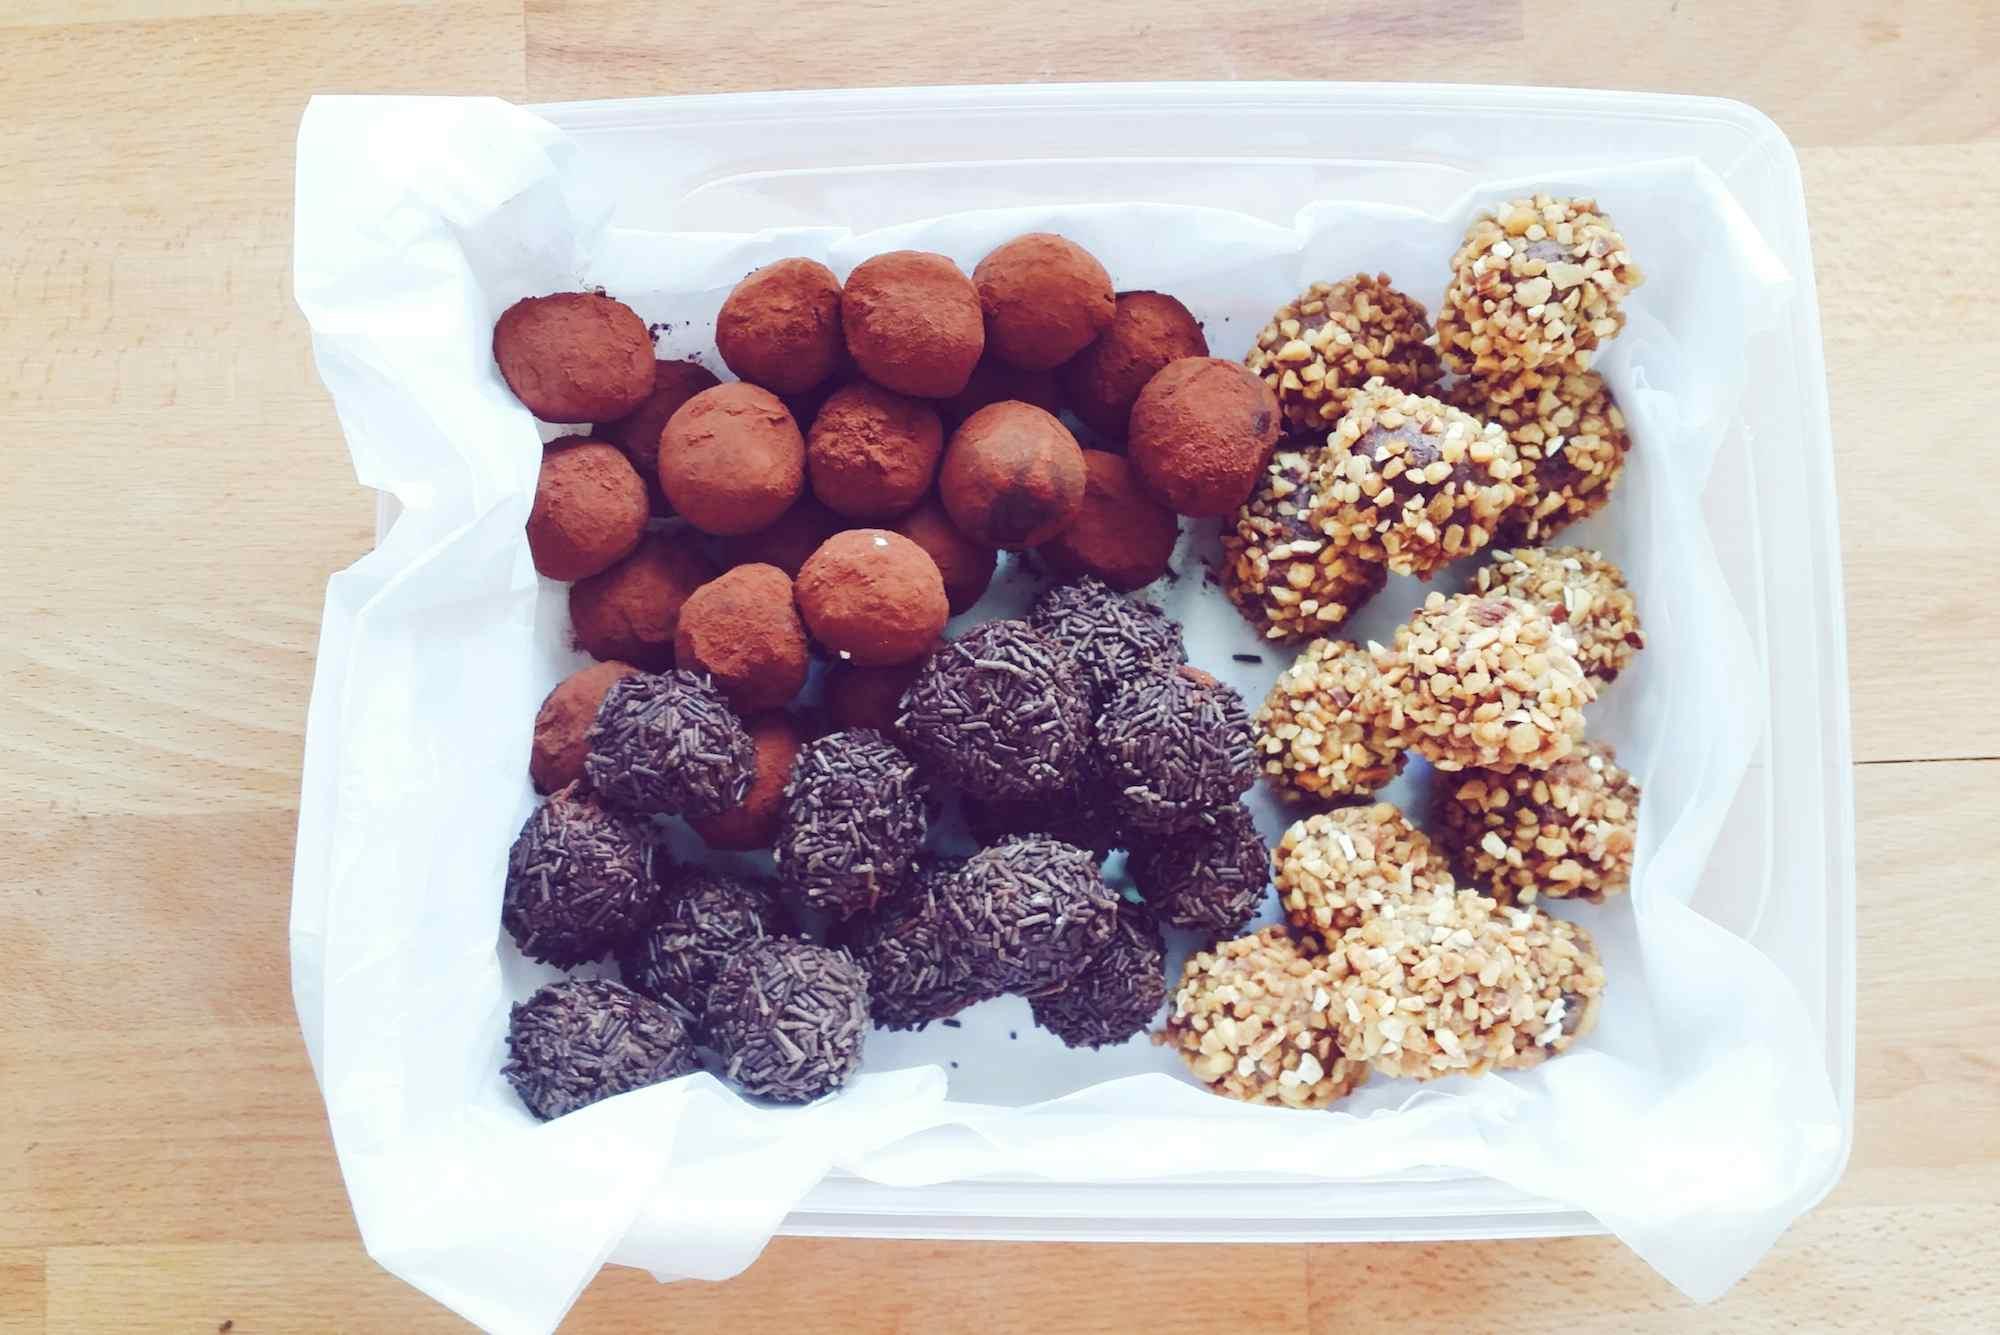 Assorted homemade Chocolate truffles